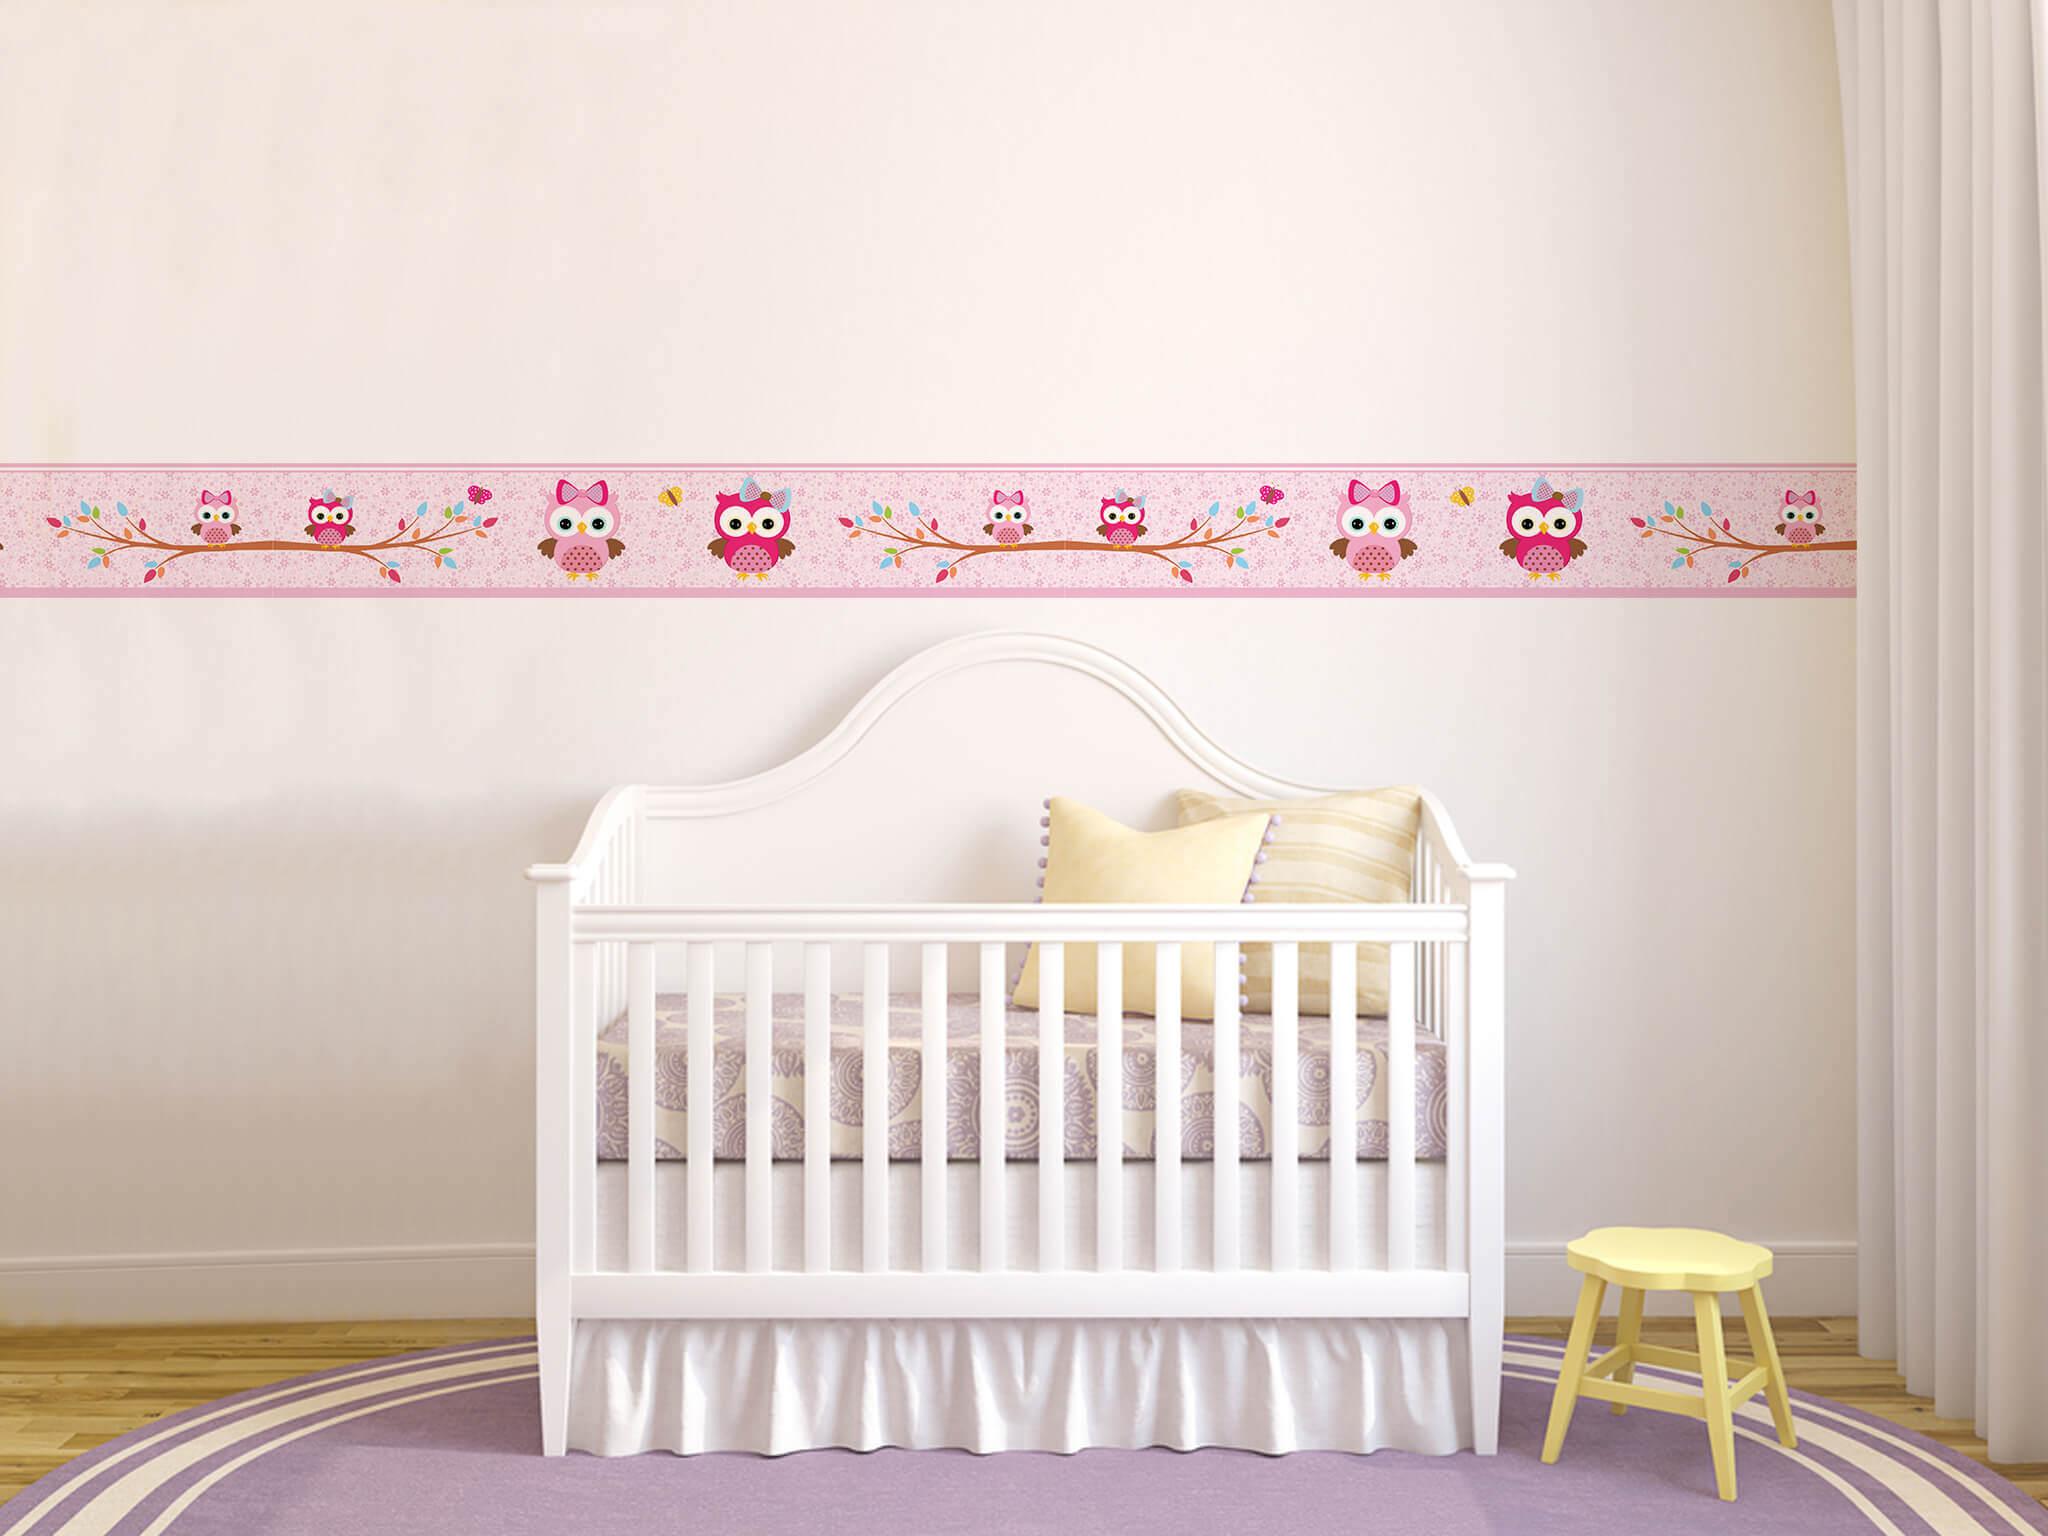 Faixa Quarto Bebe ~ decoracao do quarto de bebe faixa adesiva corujinhas border Decorar& Crescer